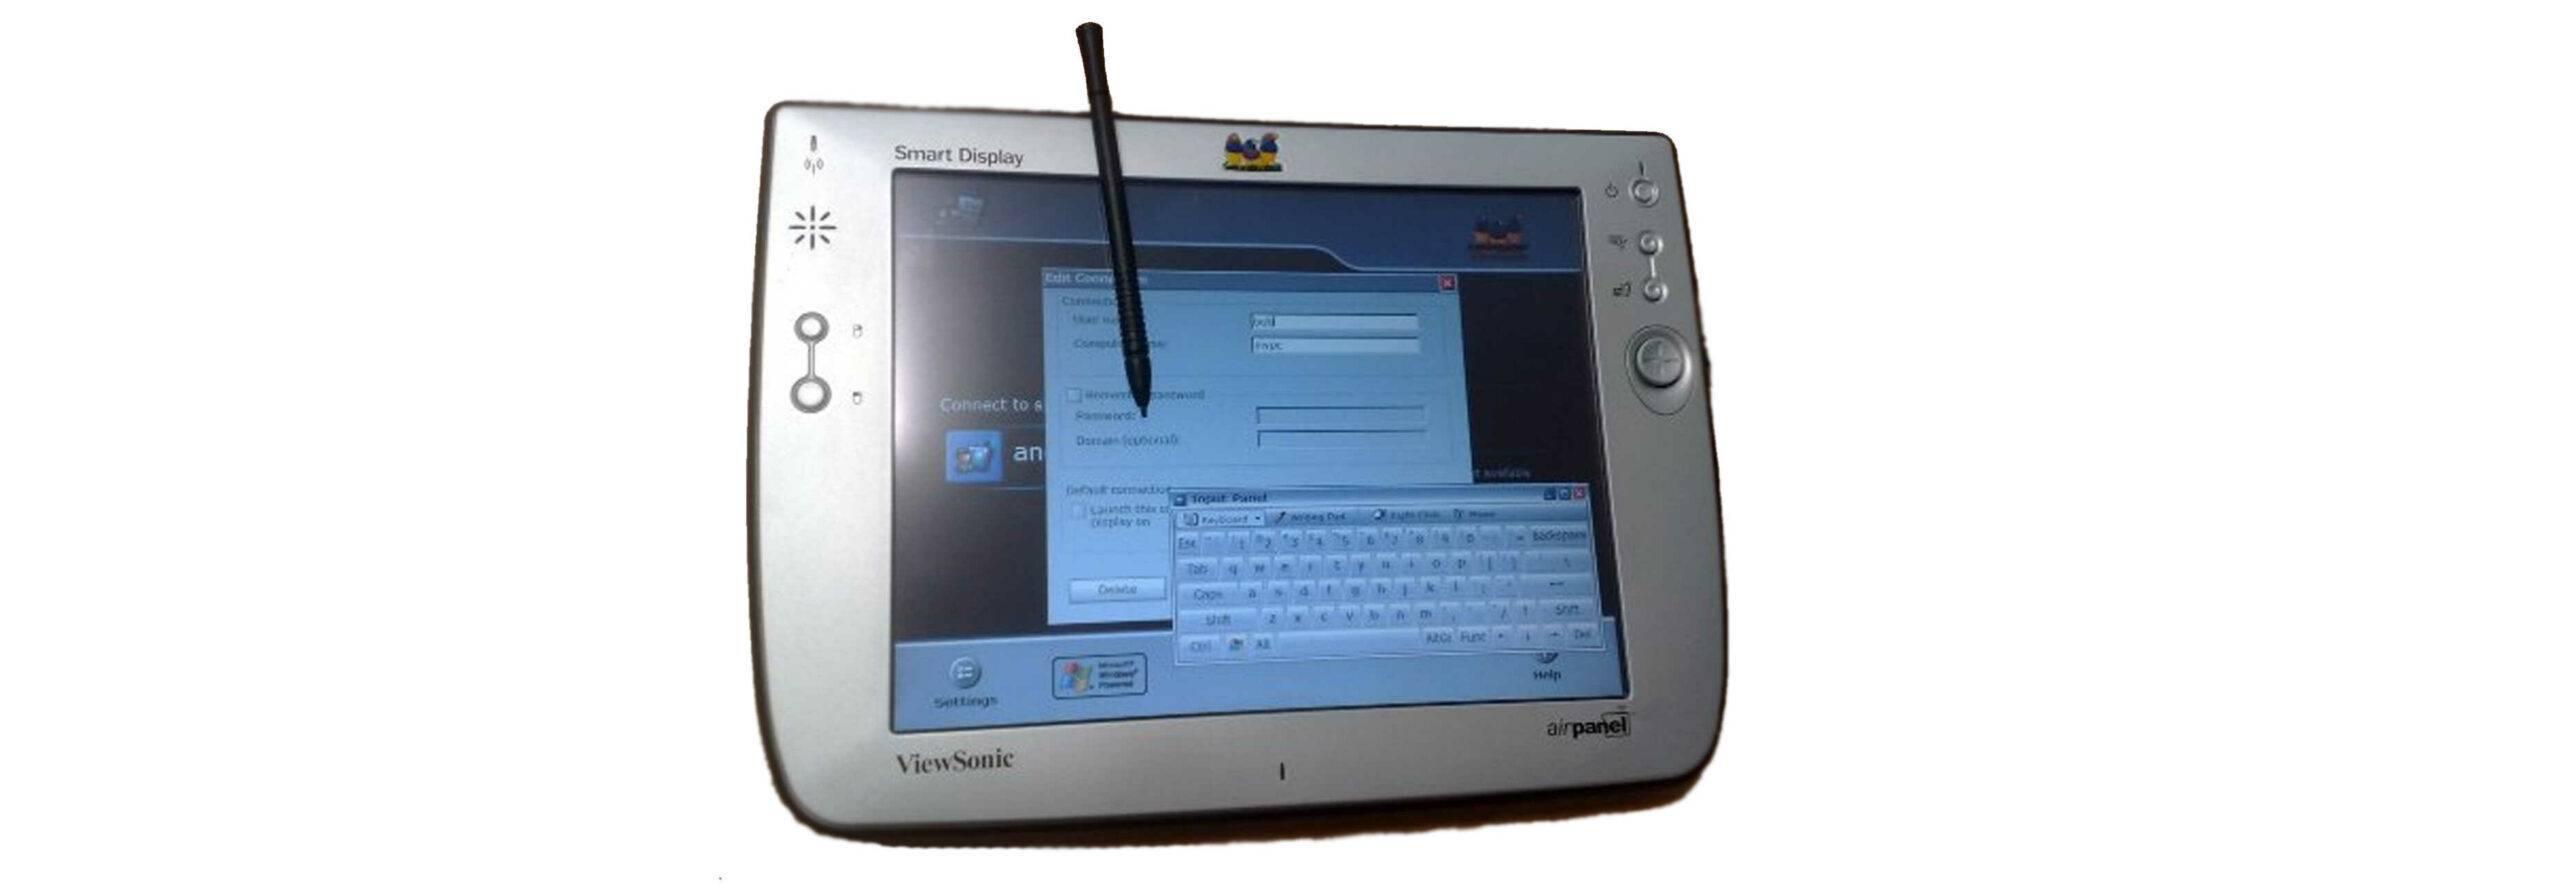 Microsoft's ViewSonic Airpanel Smart Display V110